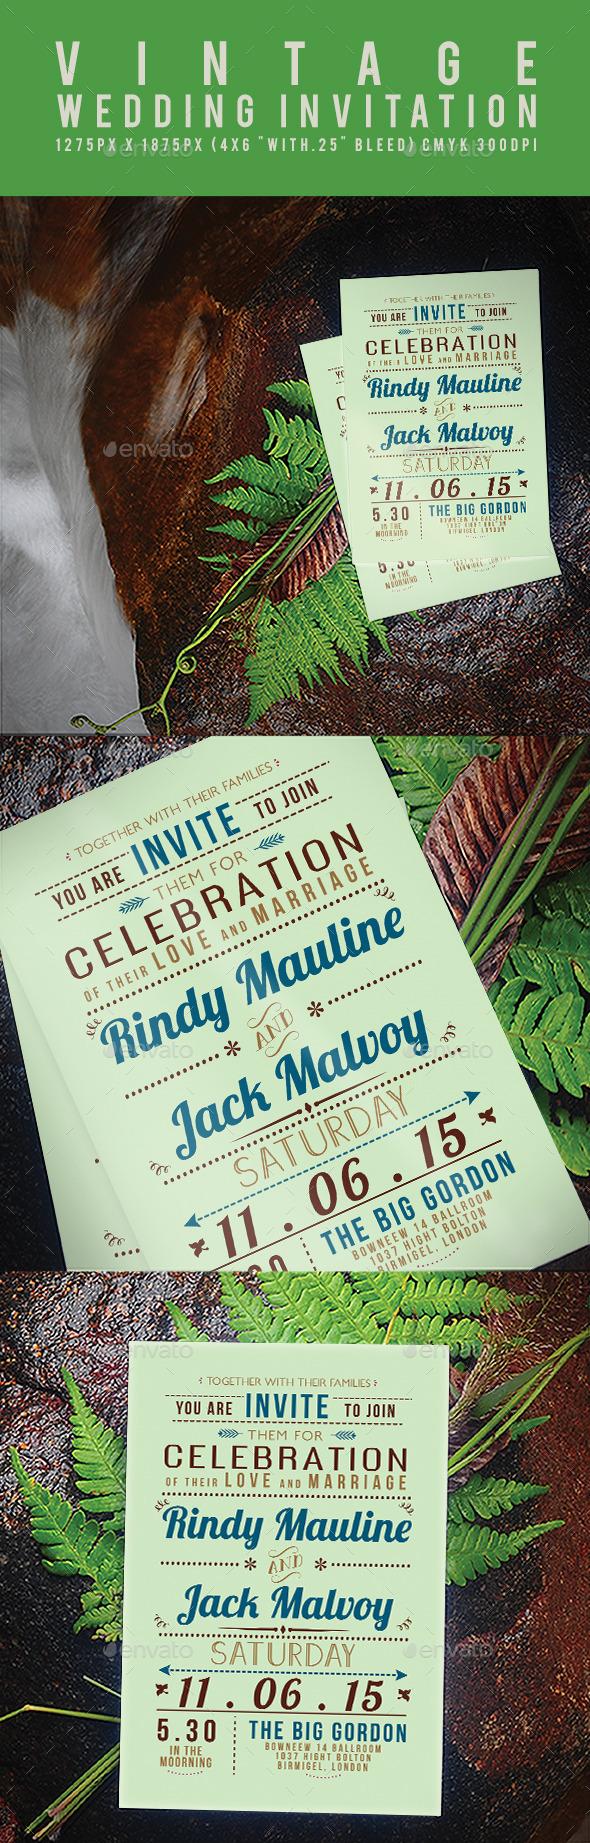 GraphicRiver Vintage Wedding Invitation 11903841